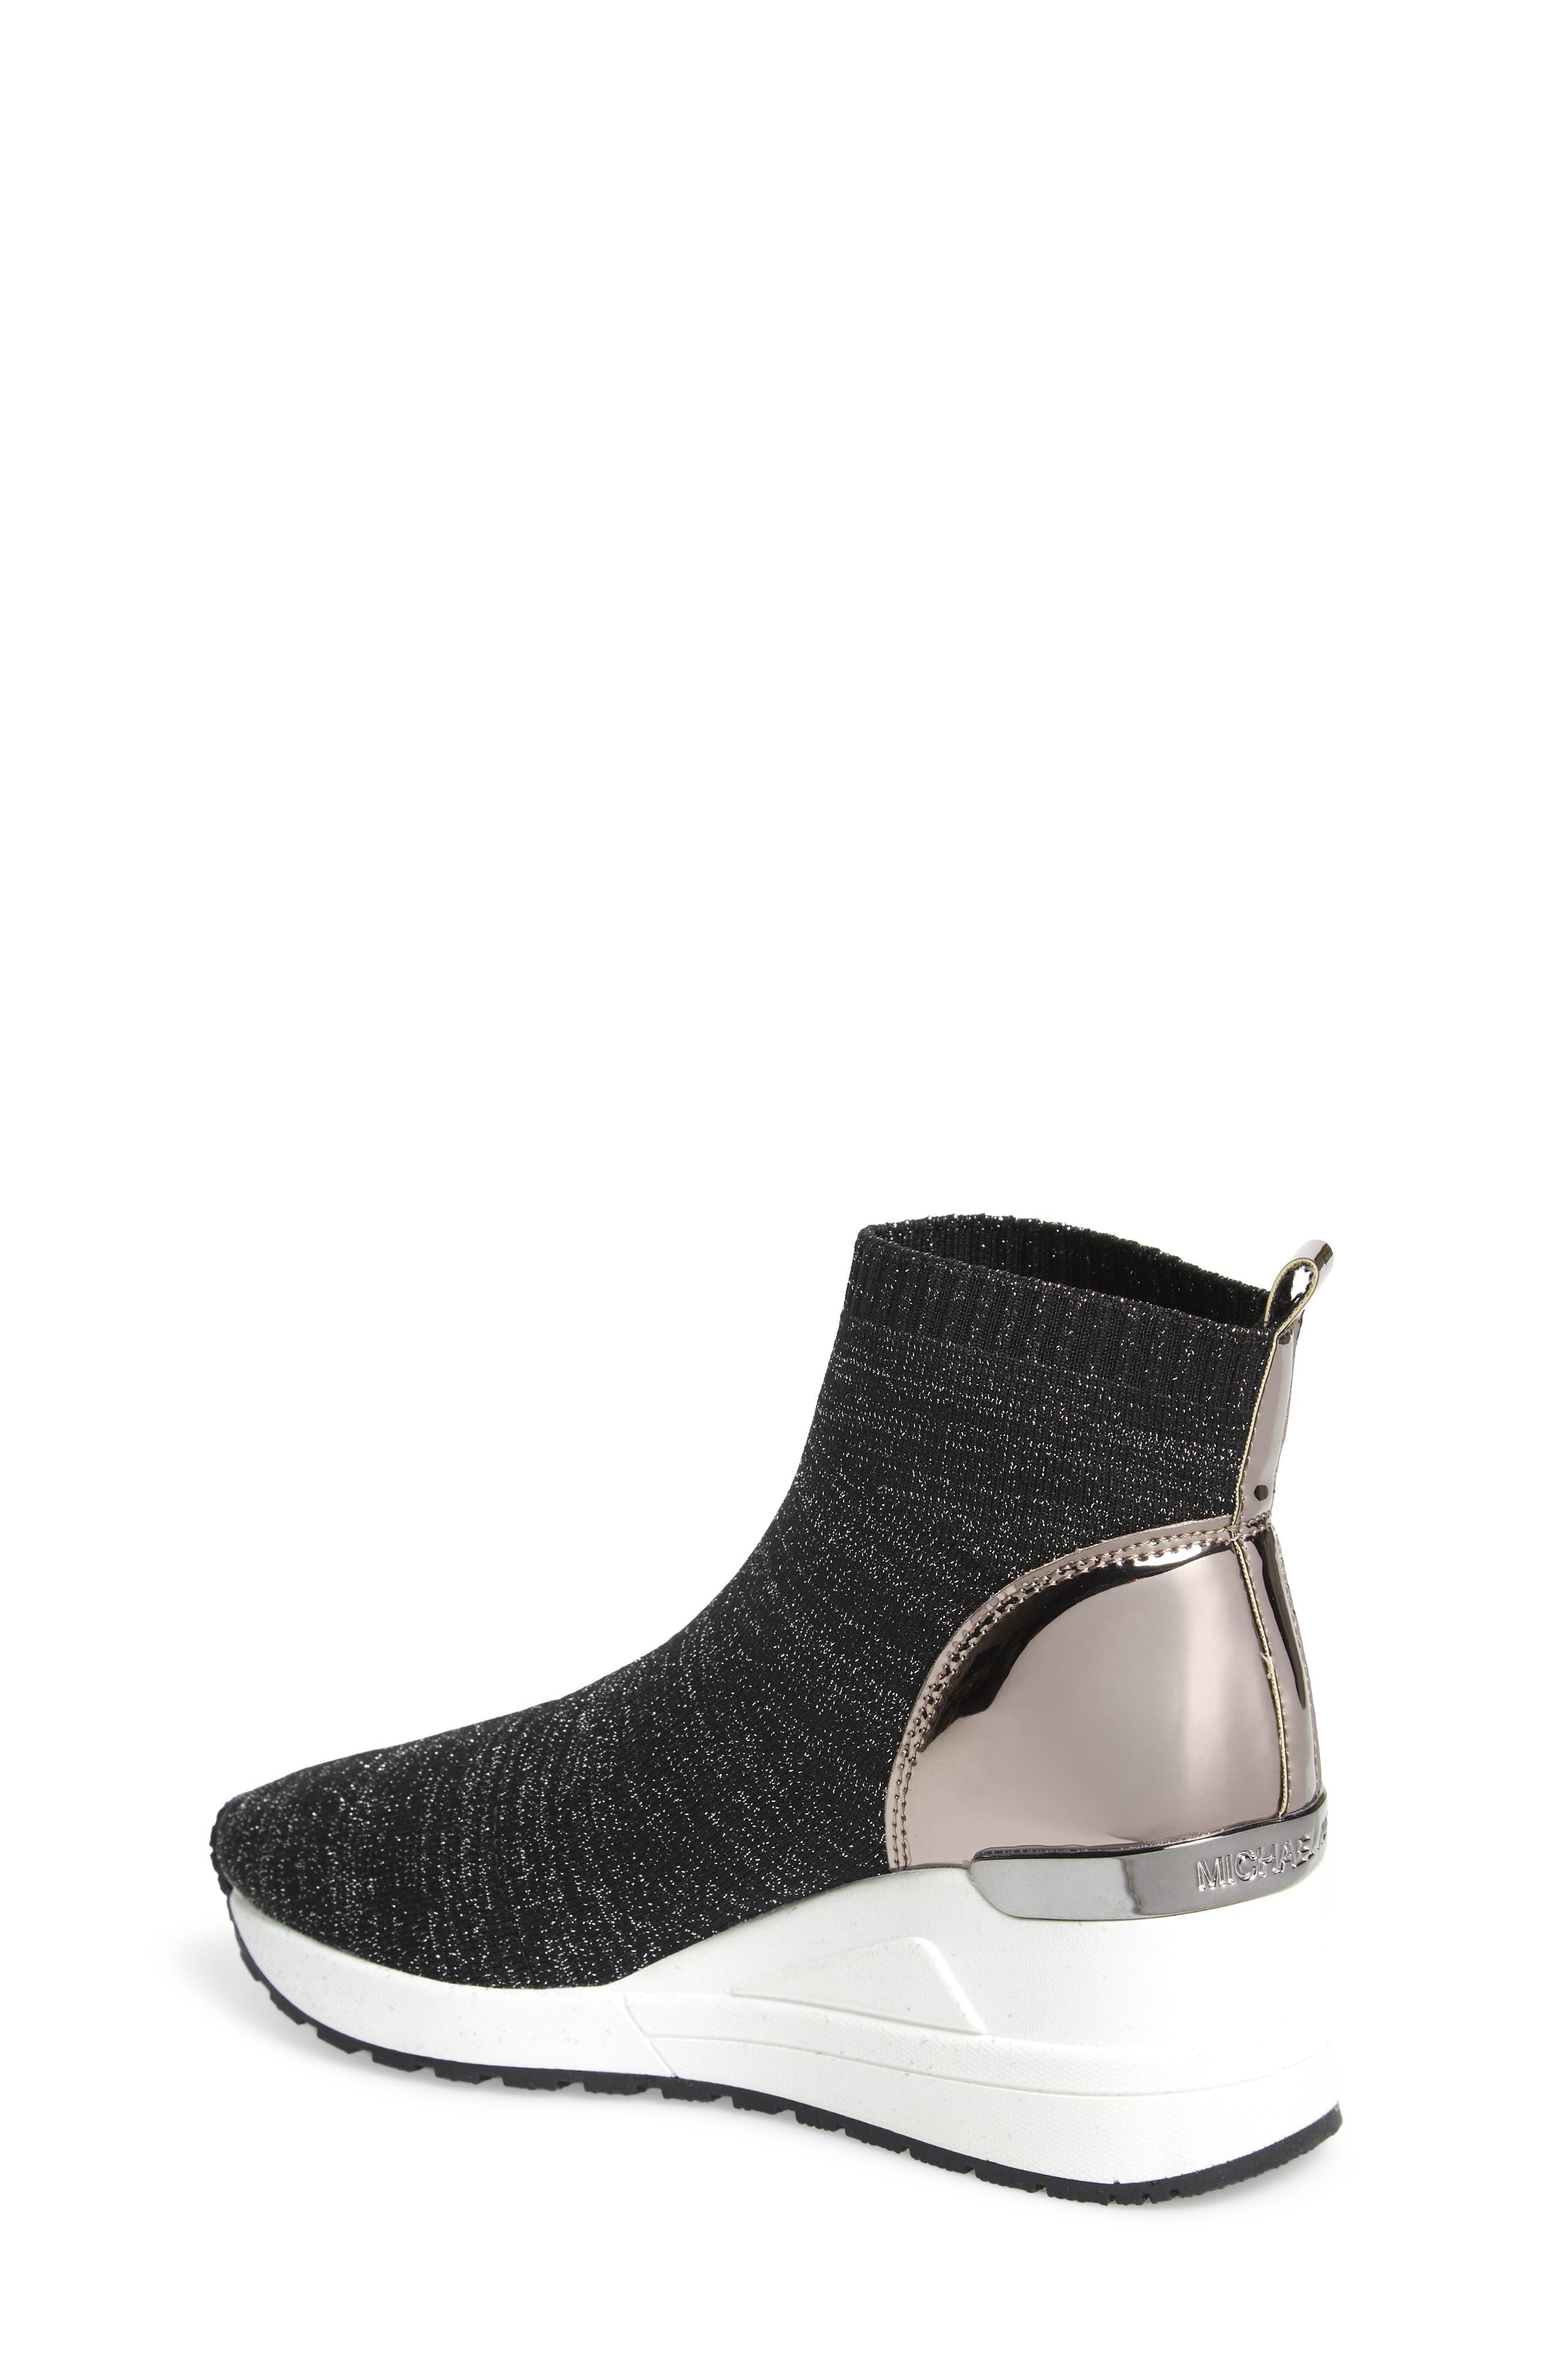 Neo Flex Metallic Wedge Sneaker,                             Alternate thumbnail 2, color,                             BLACK METALLIC